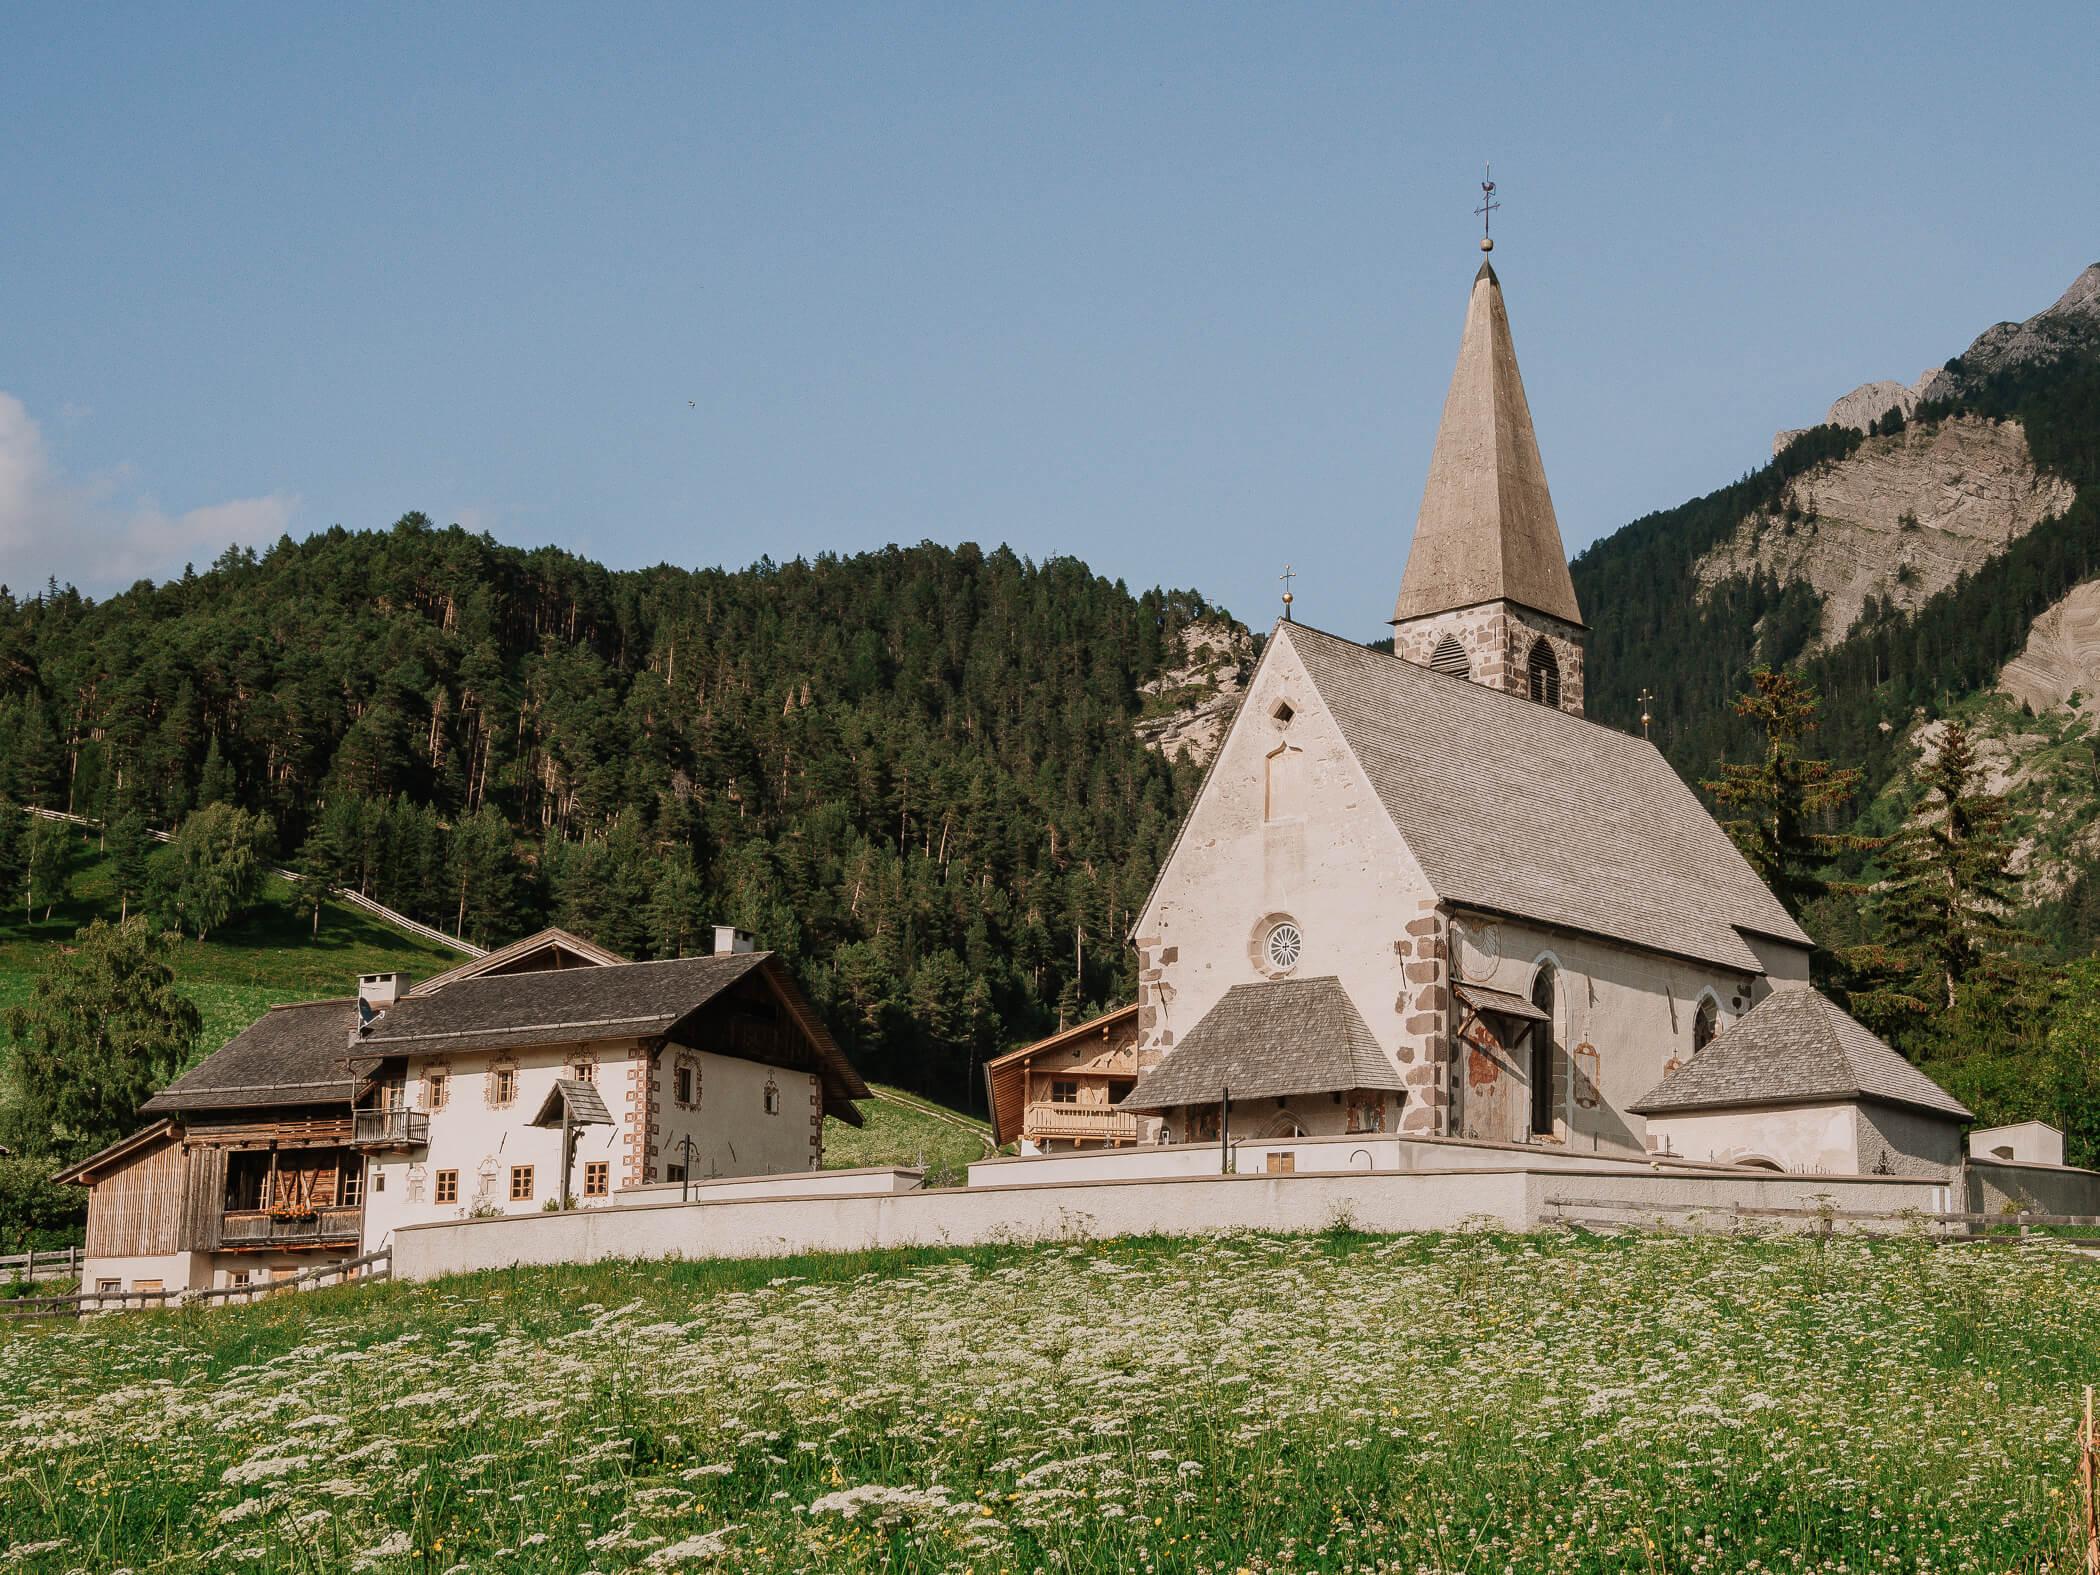 St. Magdalena im Villnösstal